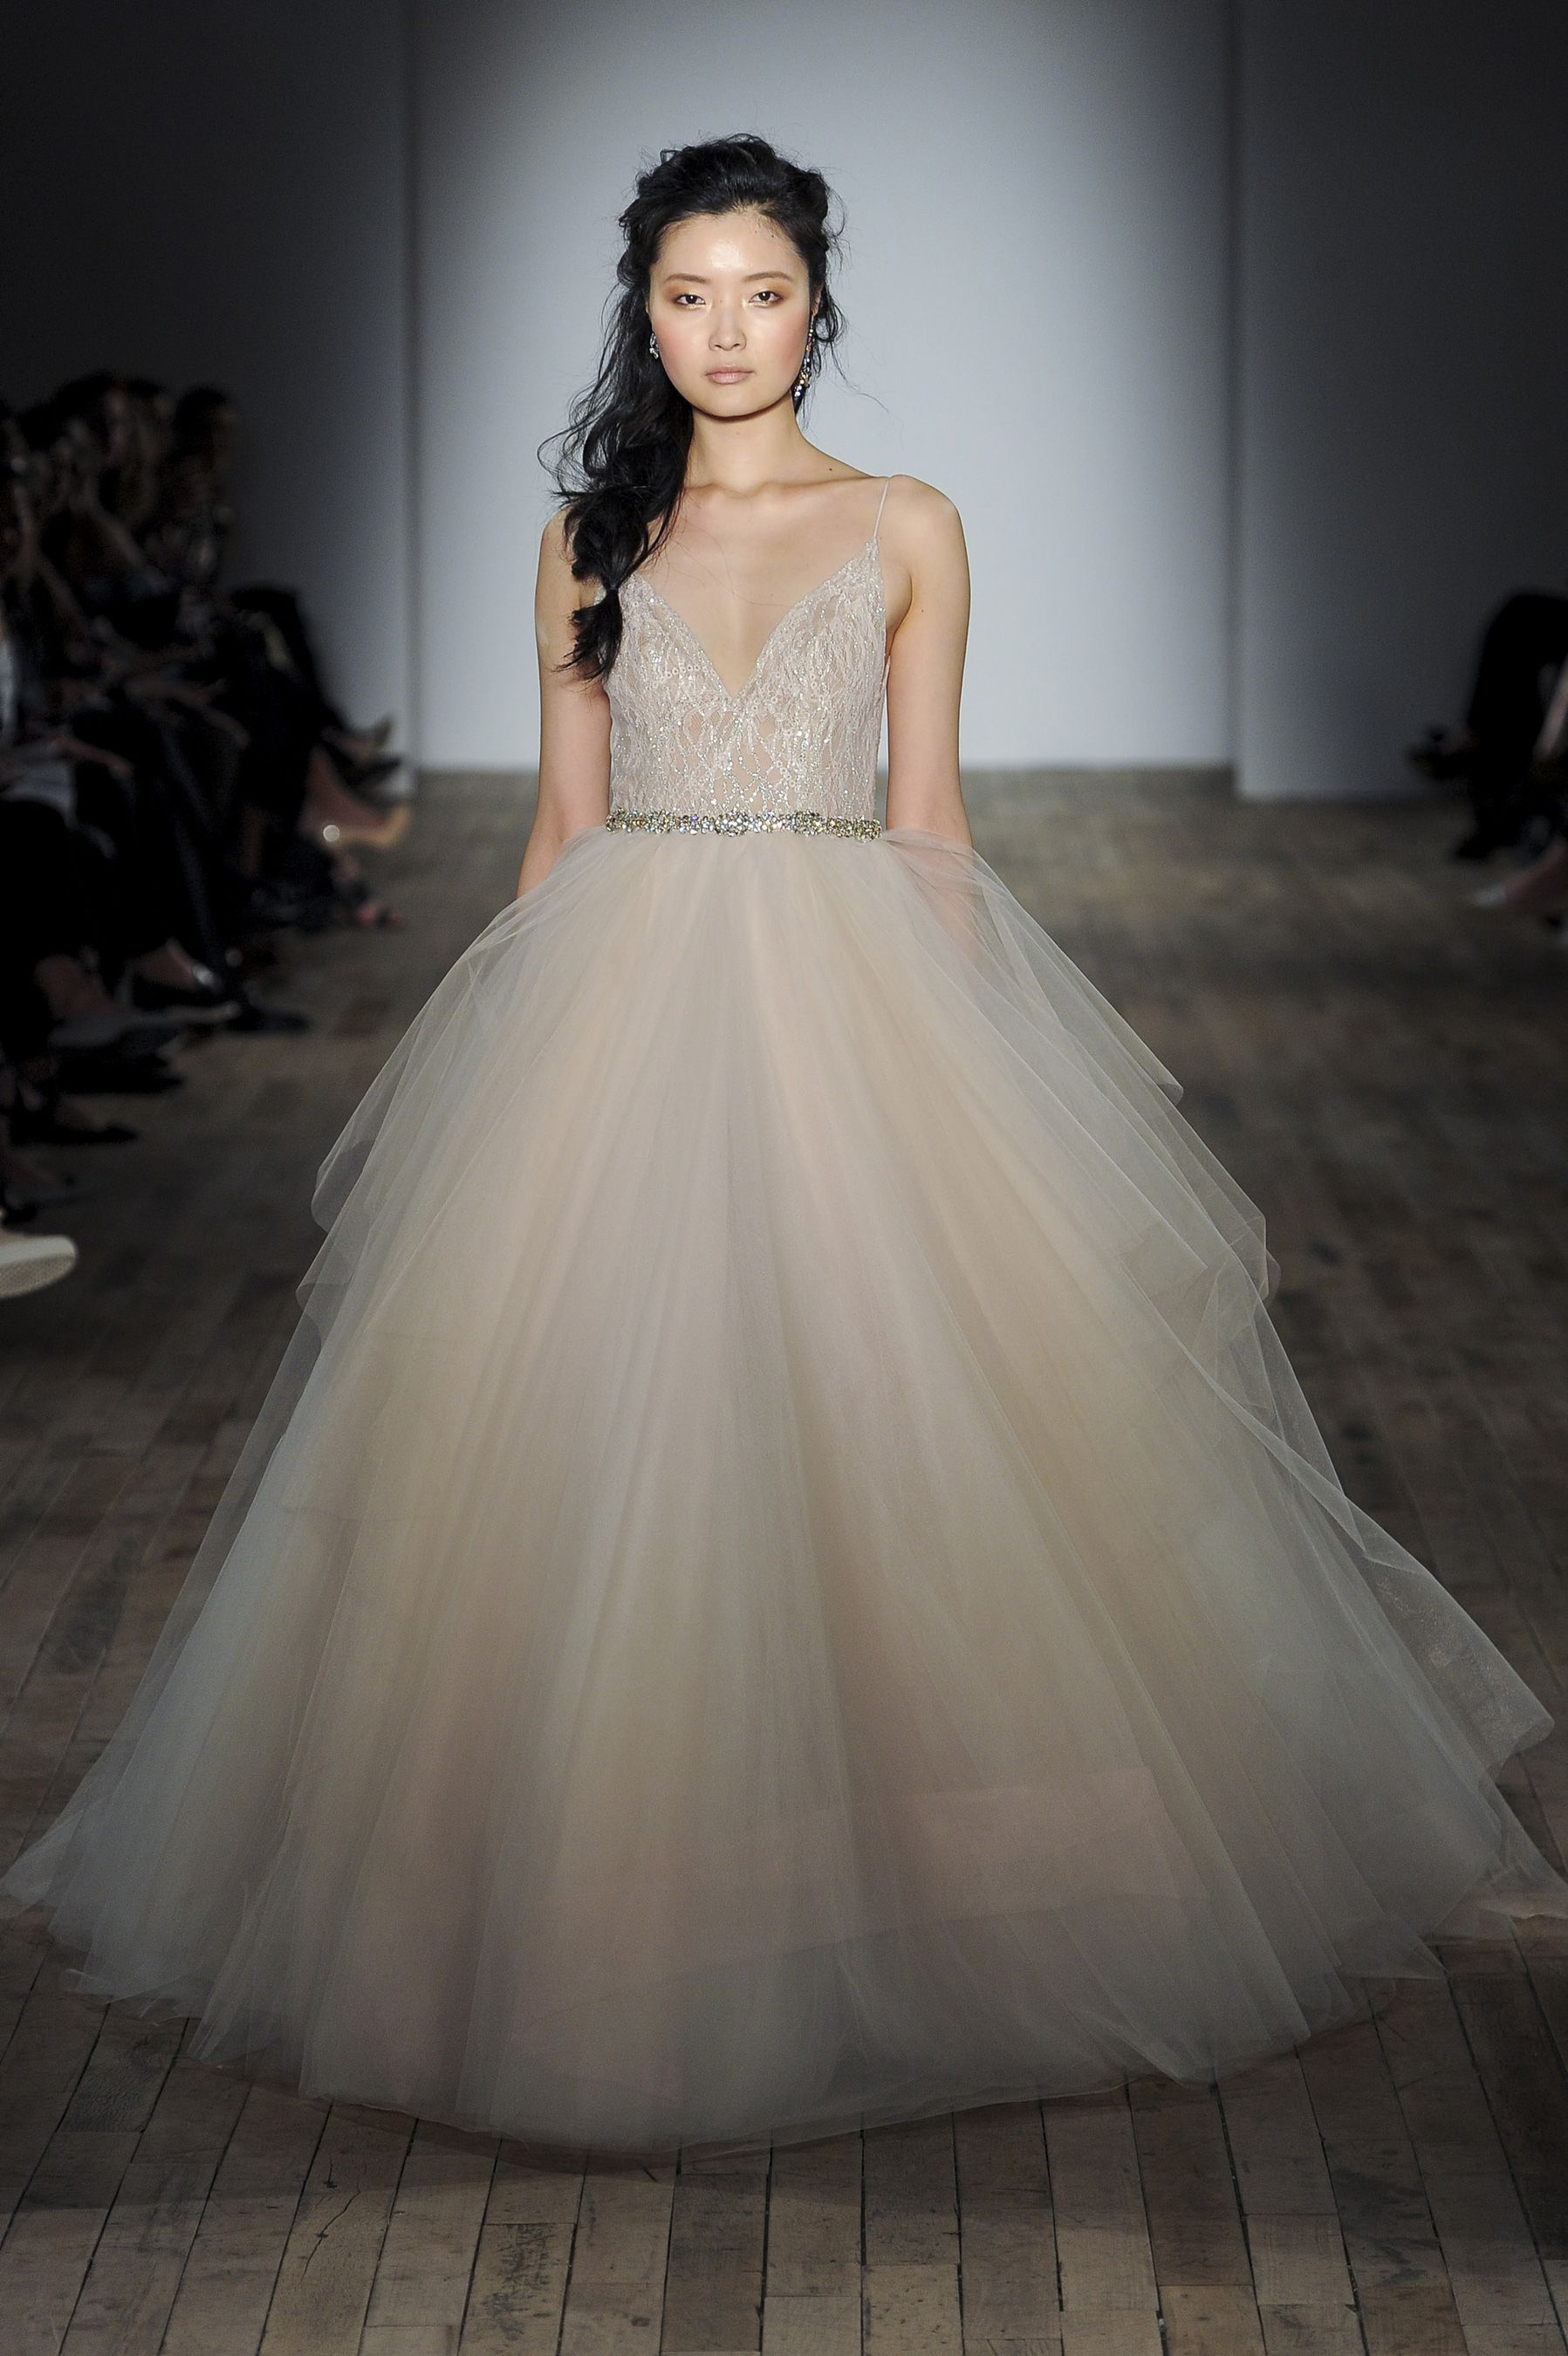 Jlm couture spring 2018 wedding dresses pinterest for Veil for champagne wedding dress